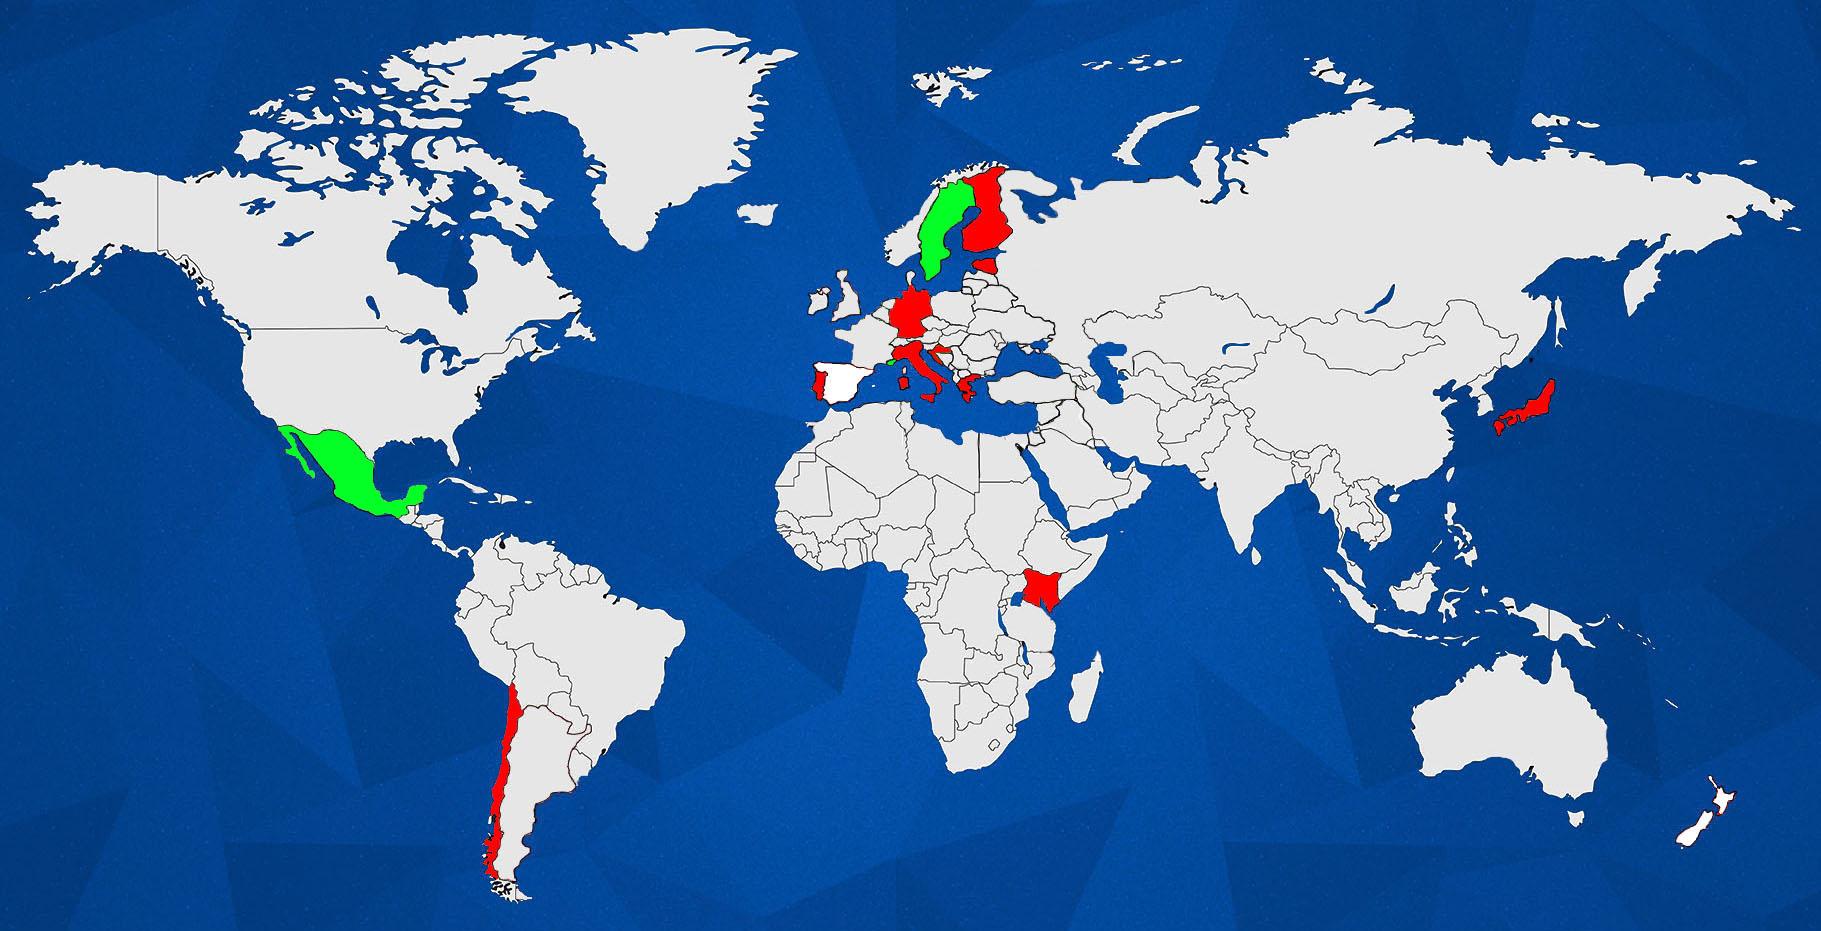 WRC WORLD MAP